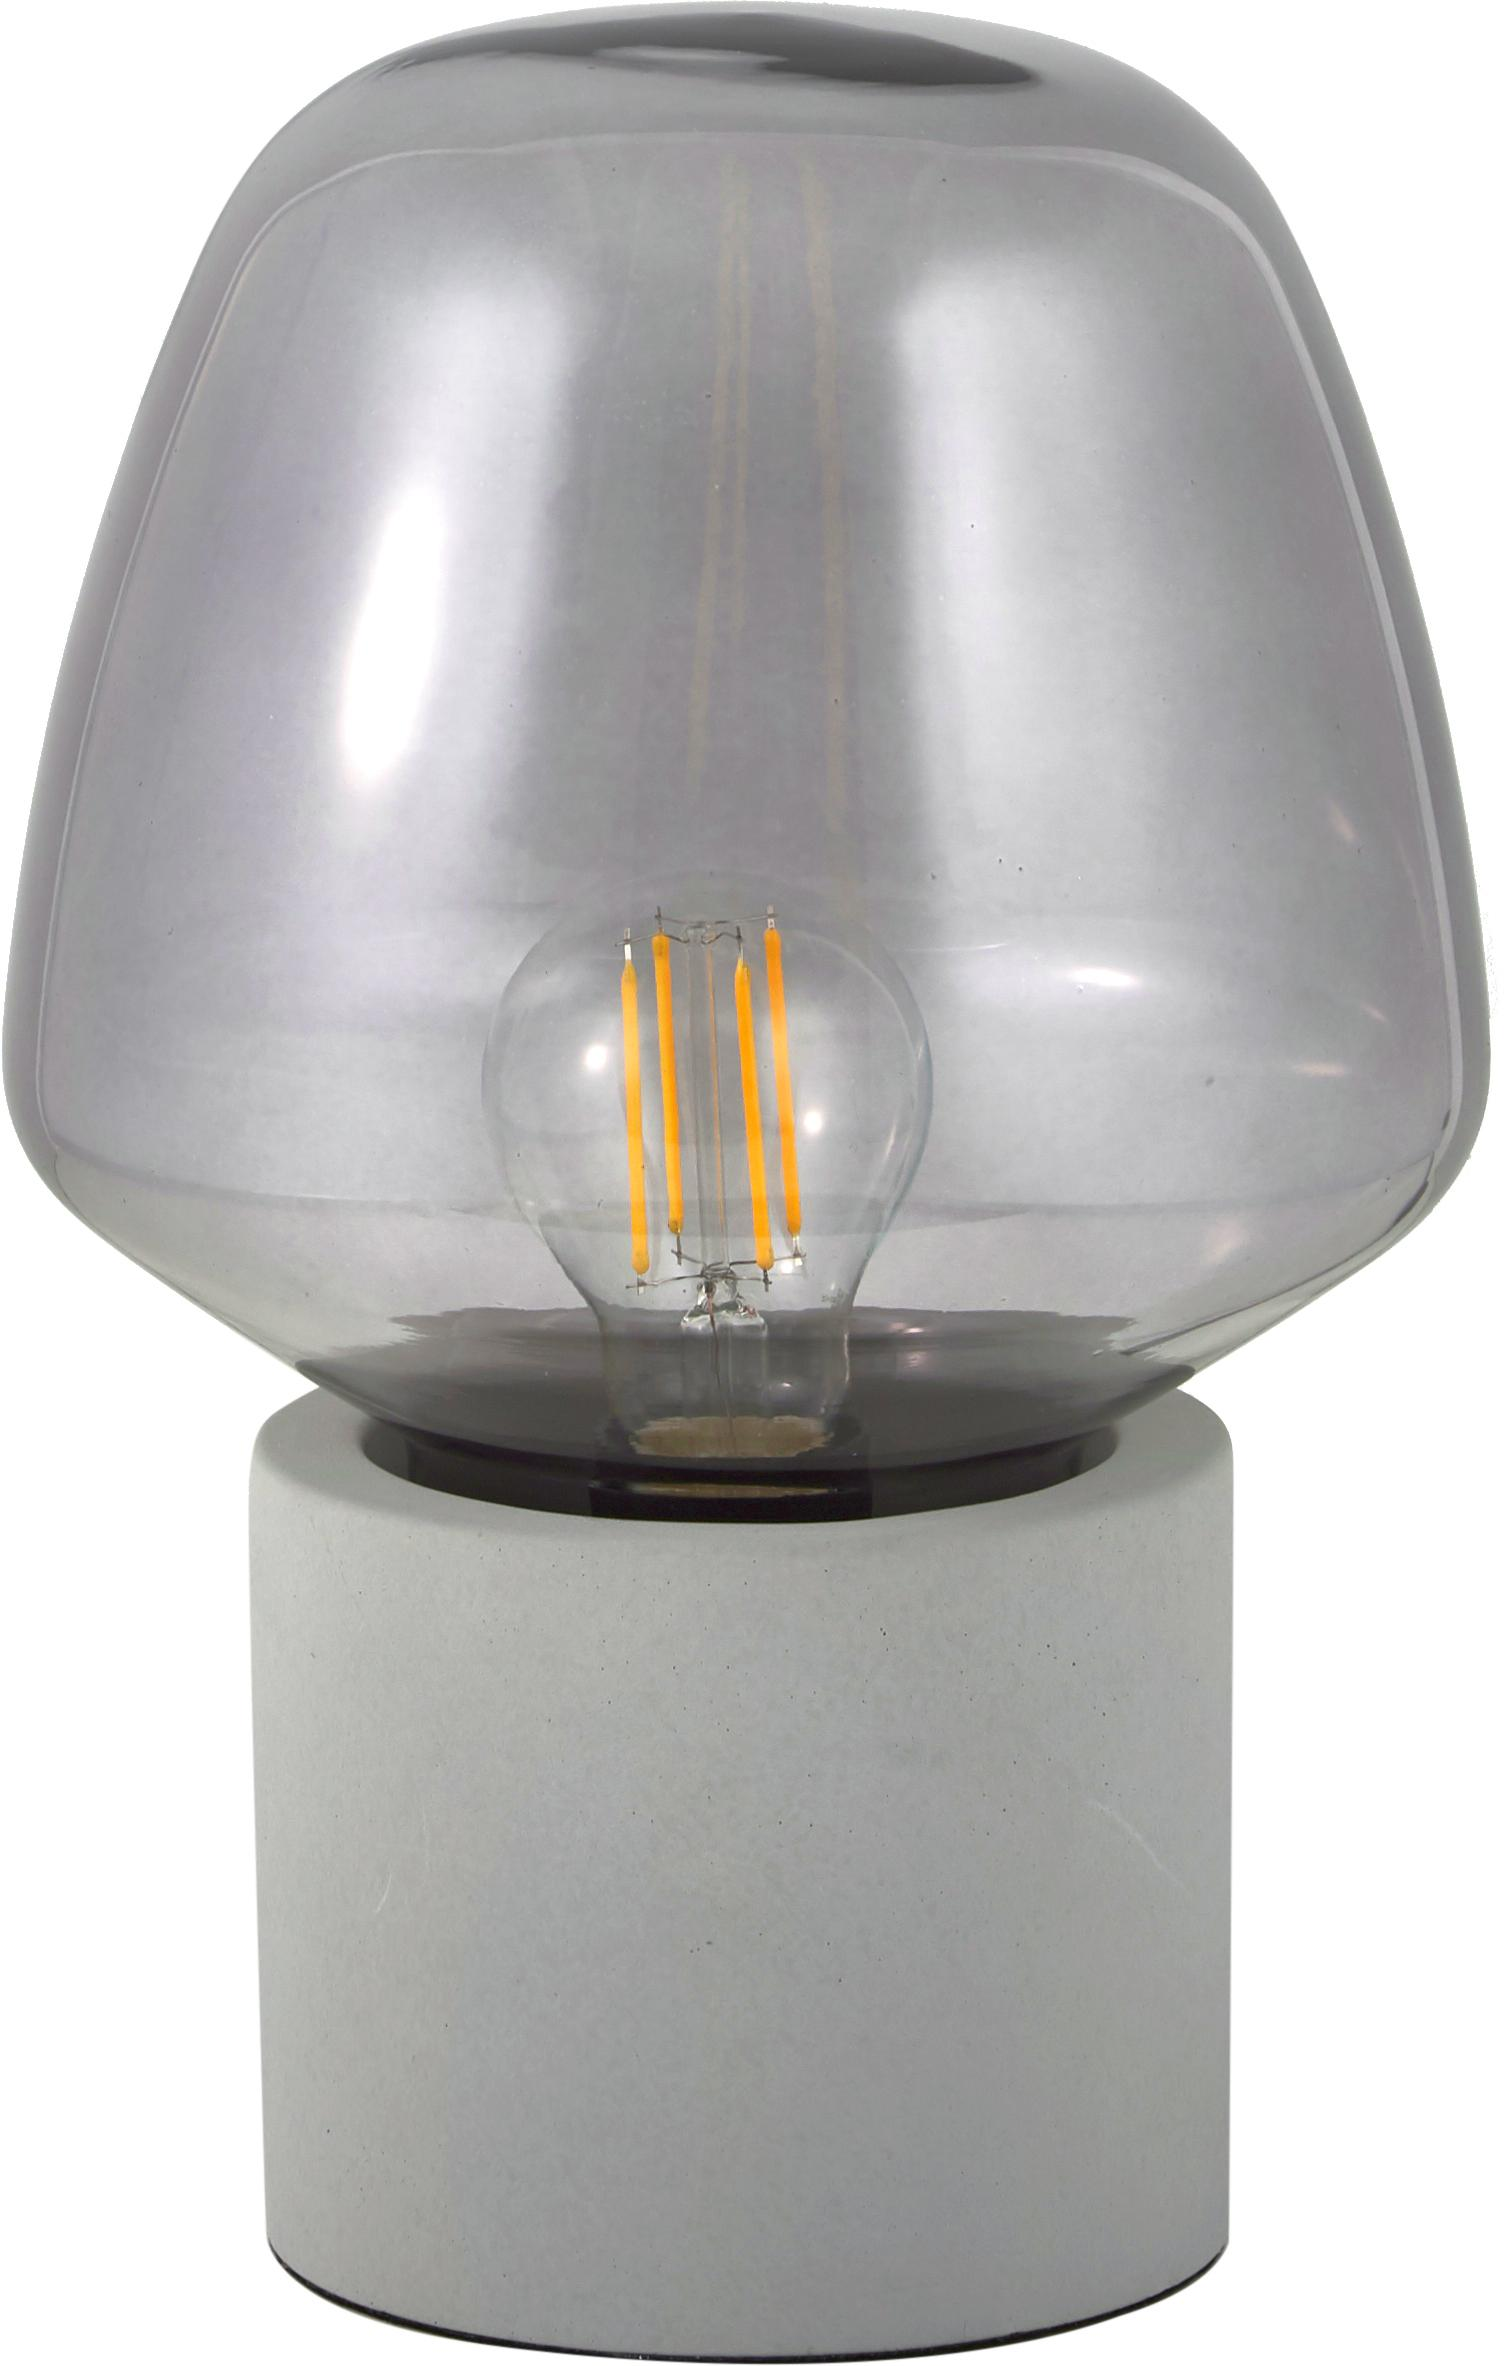 Tafellamp Christina, Lampenkap: glas, Lampvoet: betonkleurig, Betongrijs, grijs, transparant, Ø 20 x H 30 cm